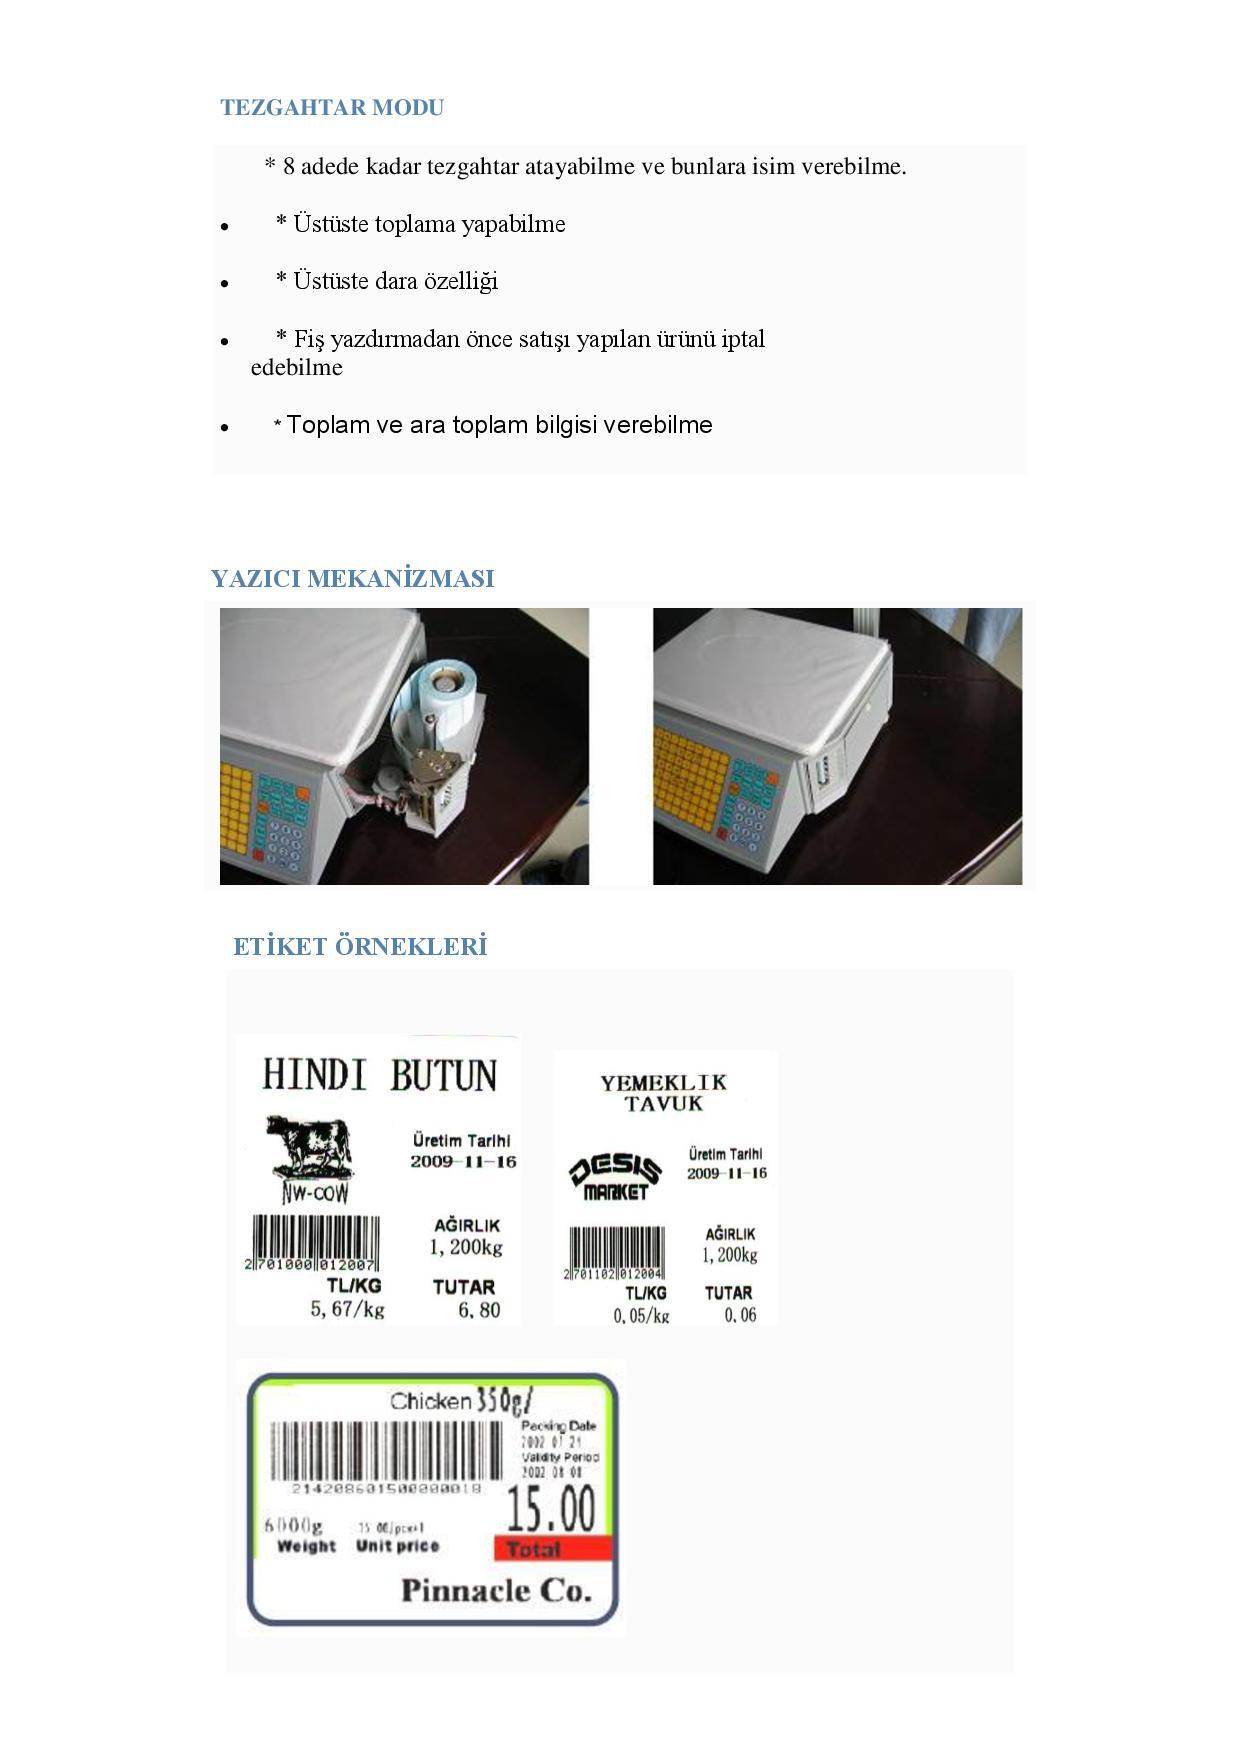 https://webdenal.s3.amazonaws.com/catalog2/140416-page-003.jpg